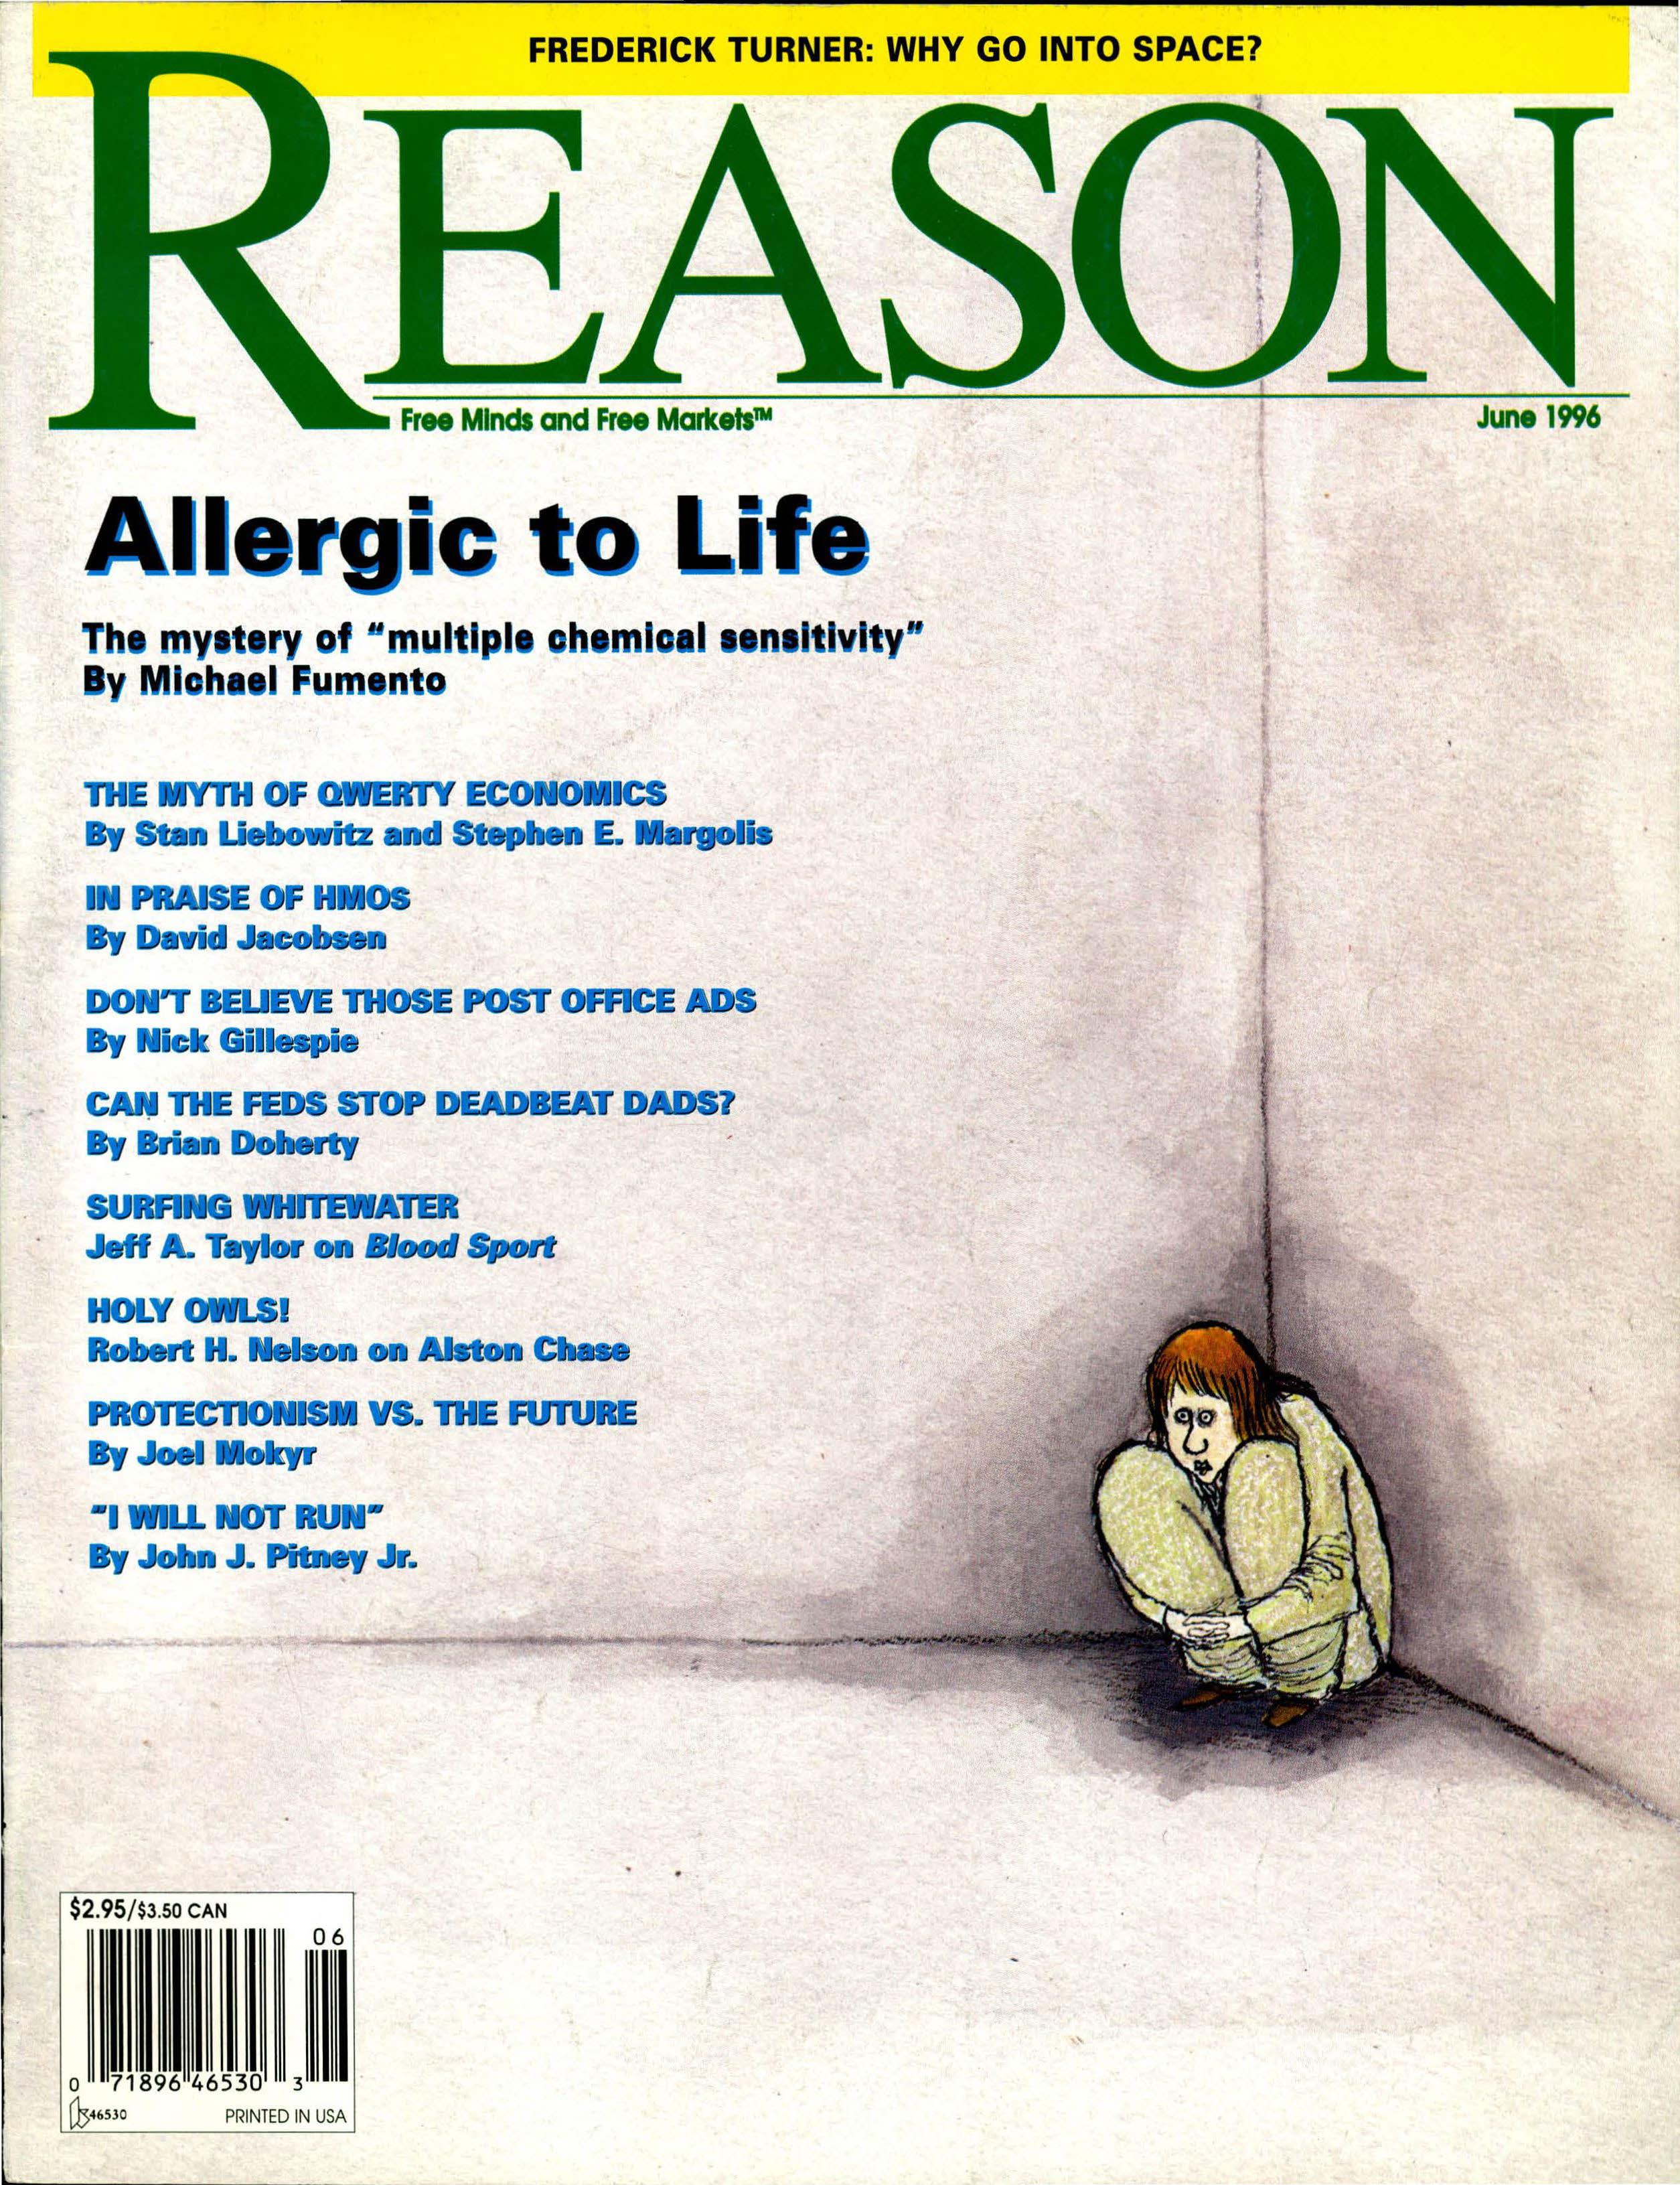 Reason Magazine, June 1996 cover image